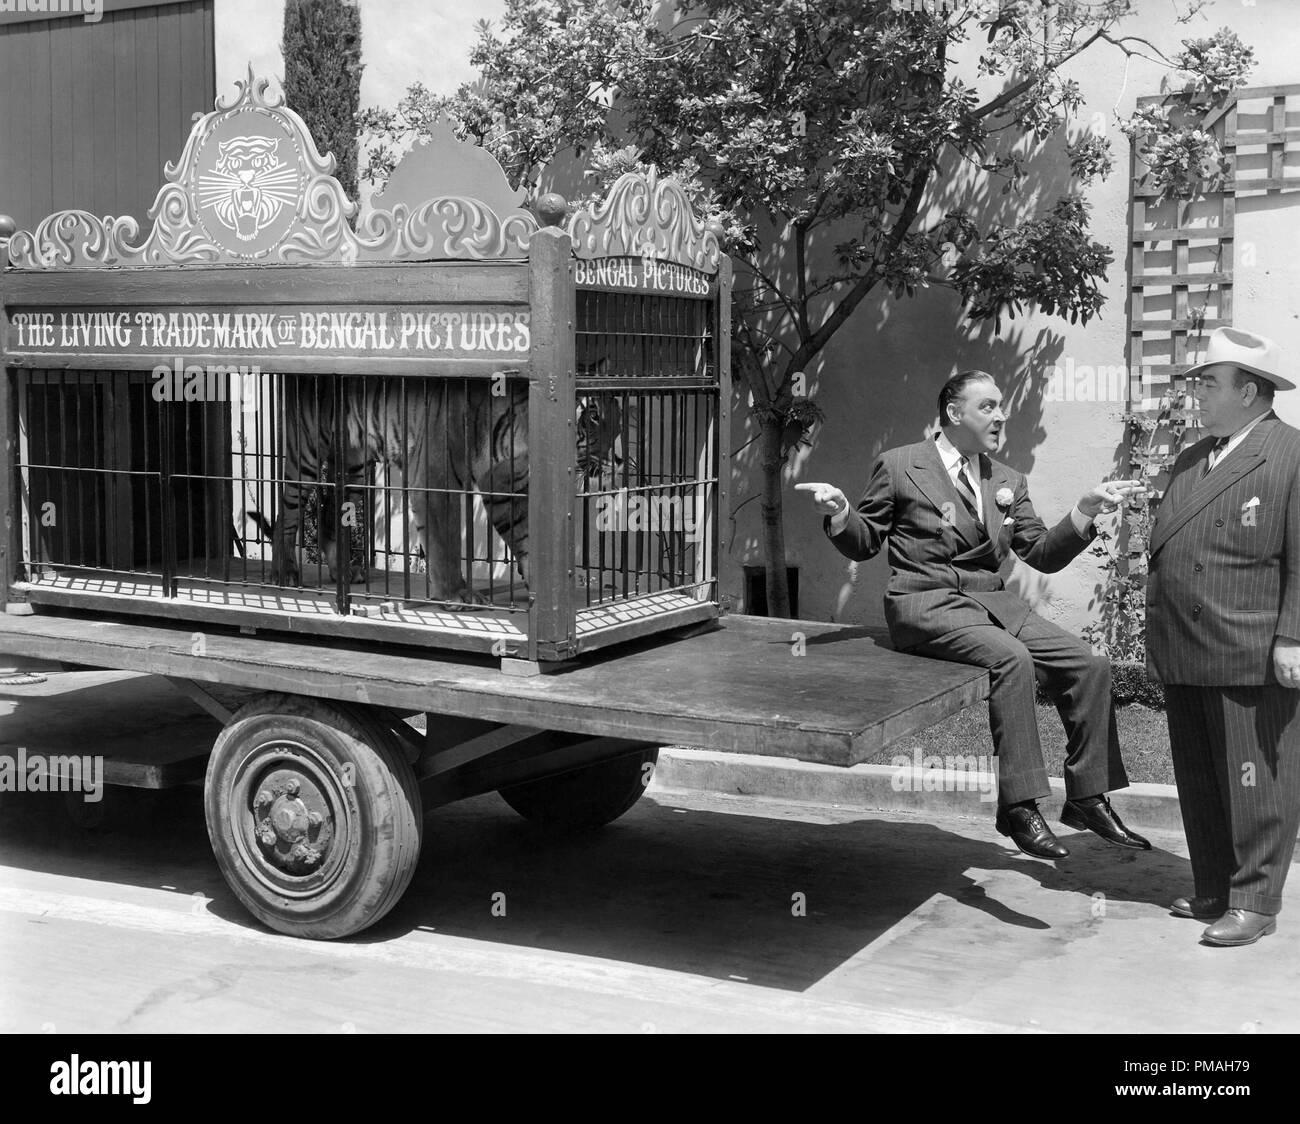 John Barrymore, 'World Premiere' 1941 Paramount File Reference # 32733_493THA - Stock Image